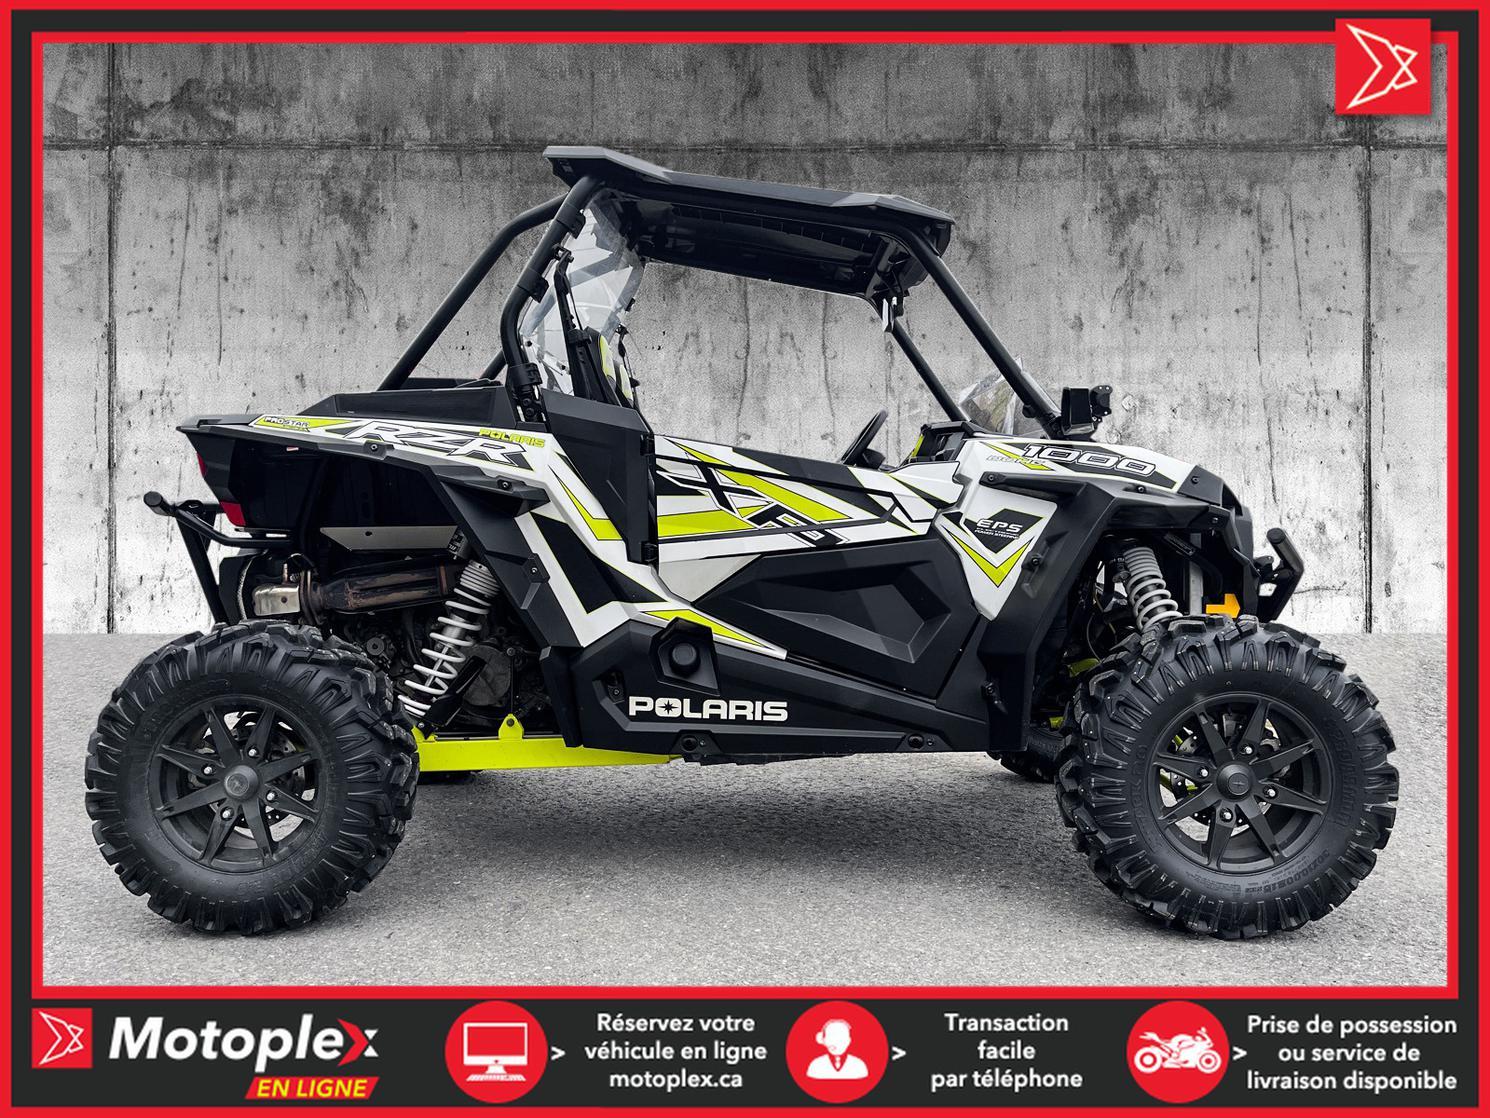 2018 Polaris RZR XP1000 EPS 74$/semaine